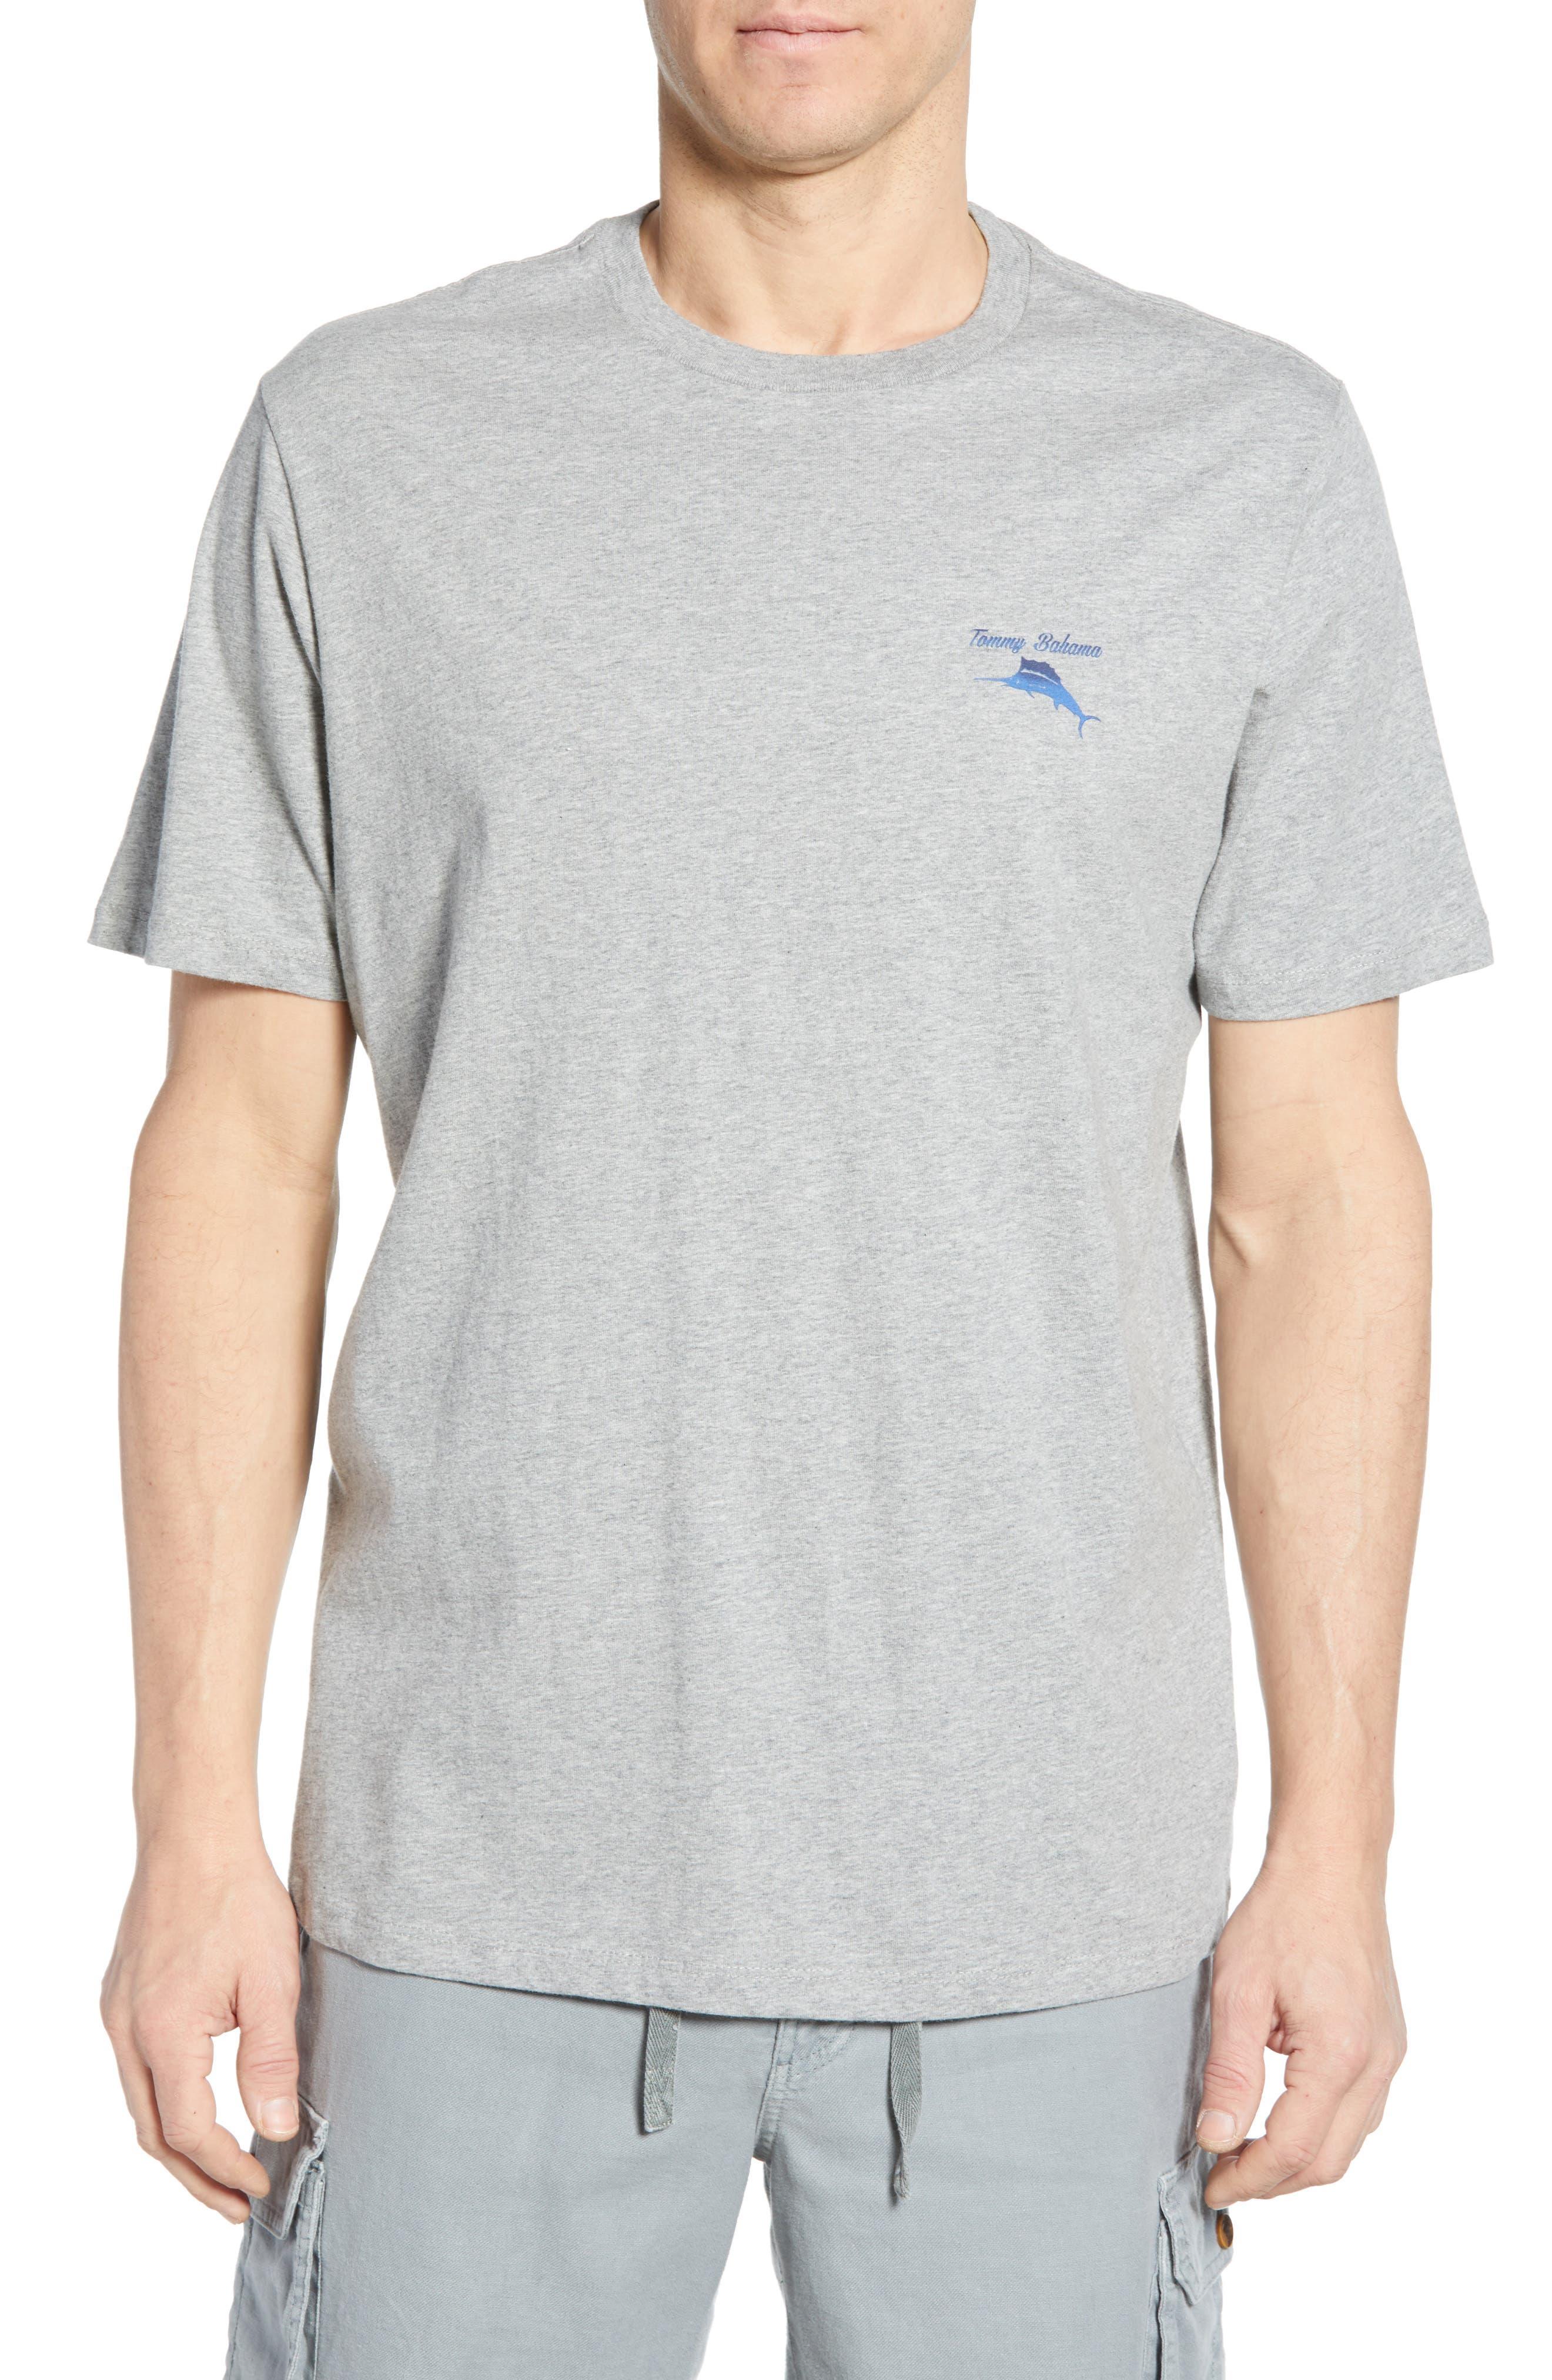 Tommy Bahama Make Ship Happen Graphic T-Shirt, Grey